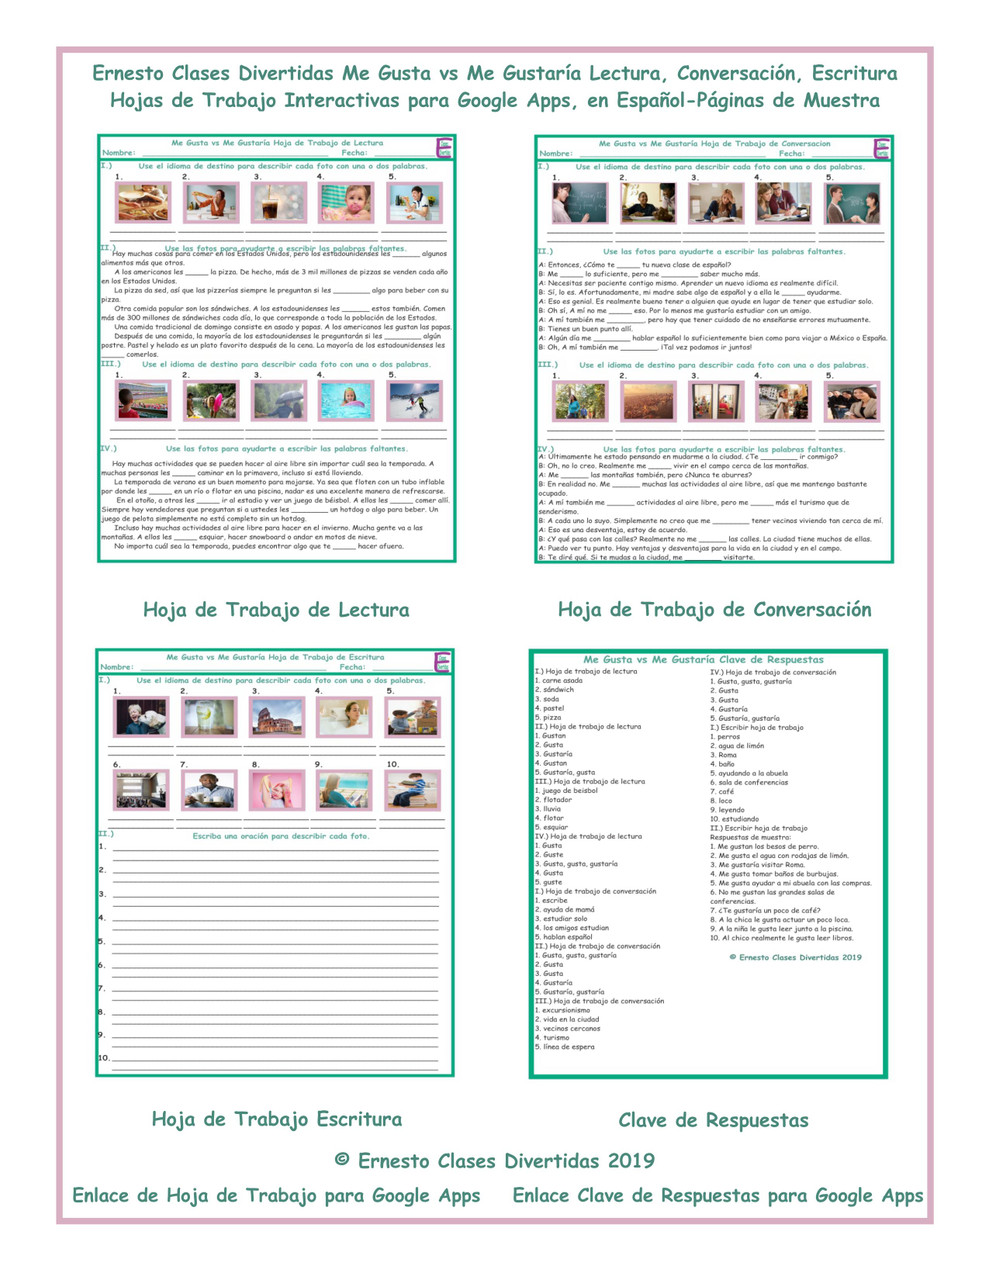 Gusta vs Me Gustaria Read-Converse-Write Spanish Interactive Worksheets-Google Apps